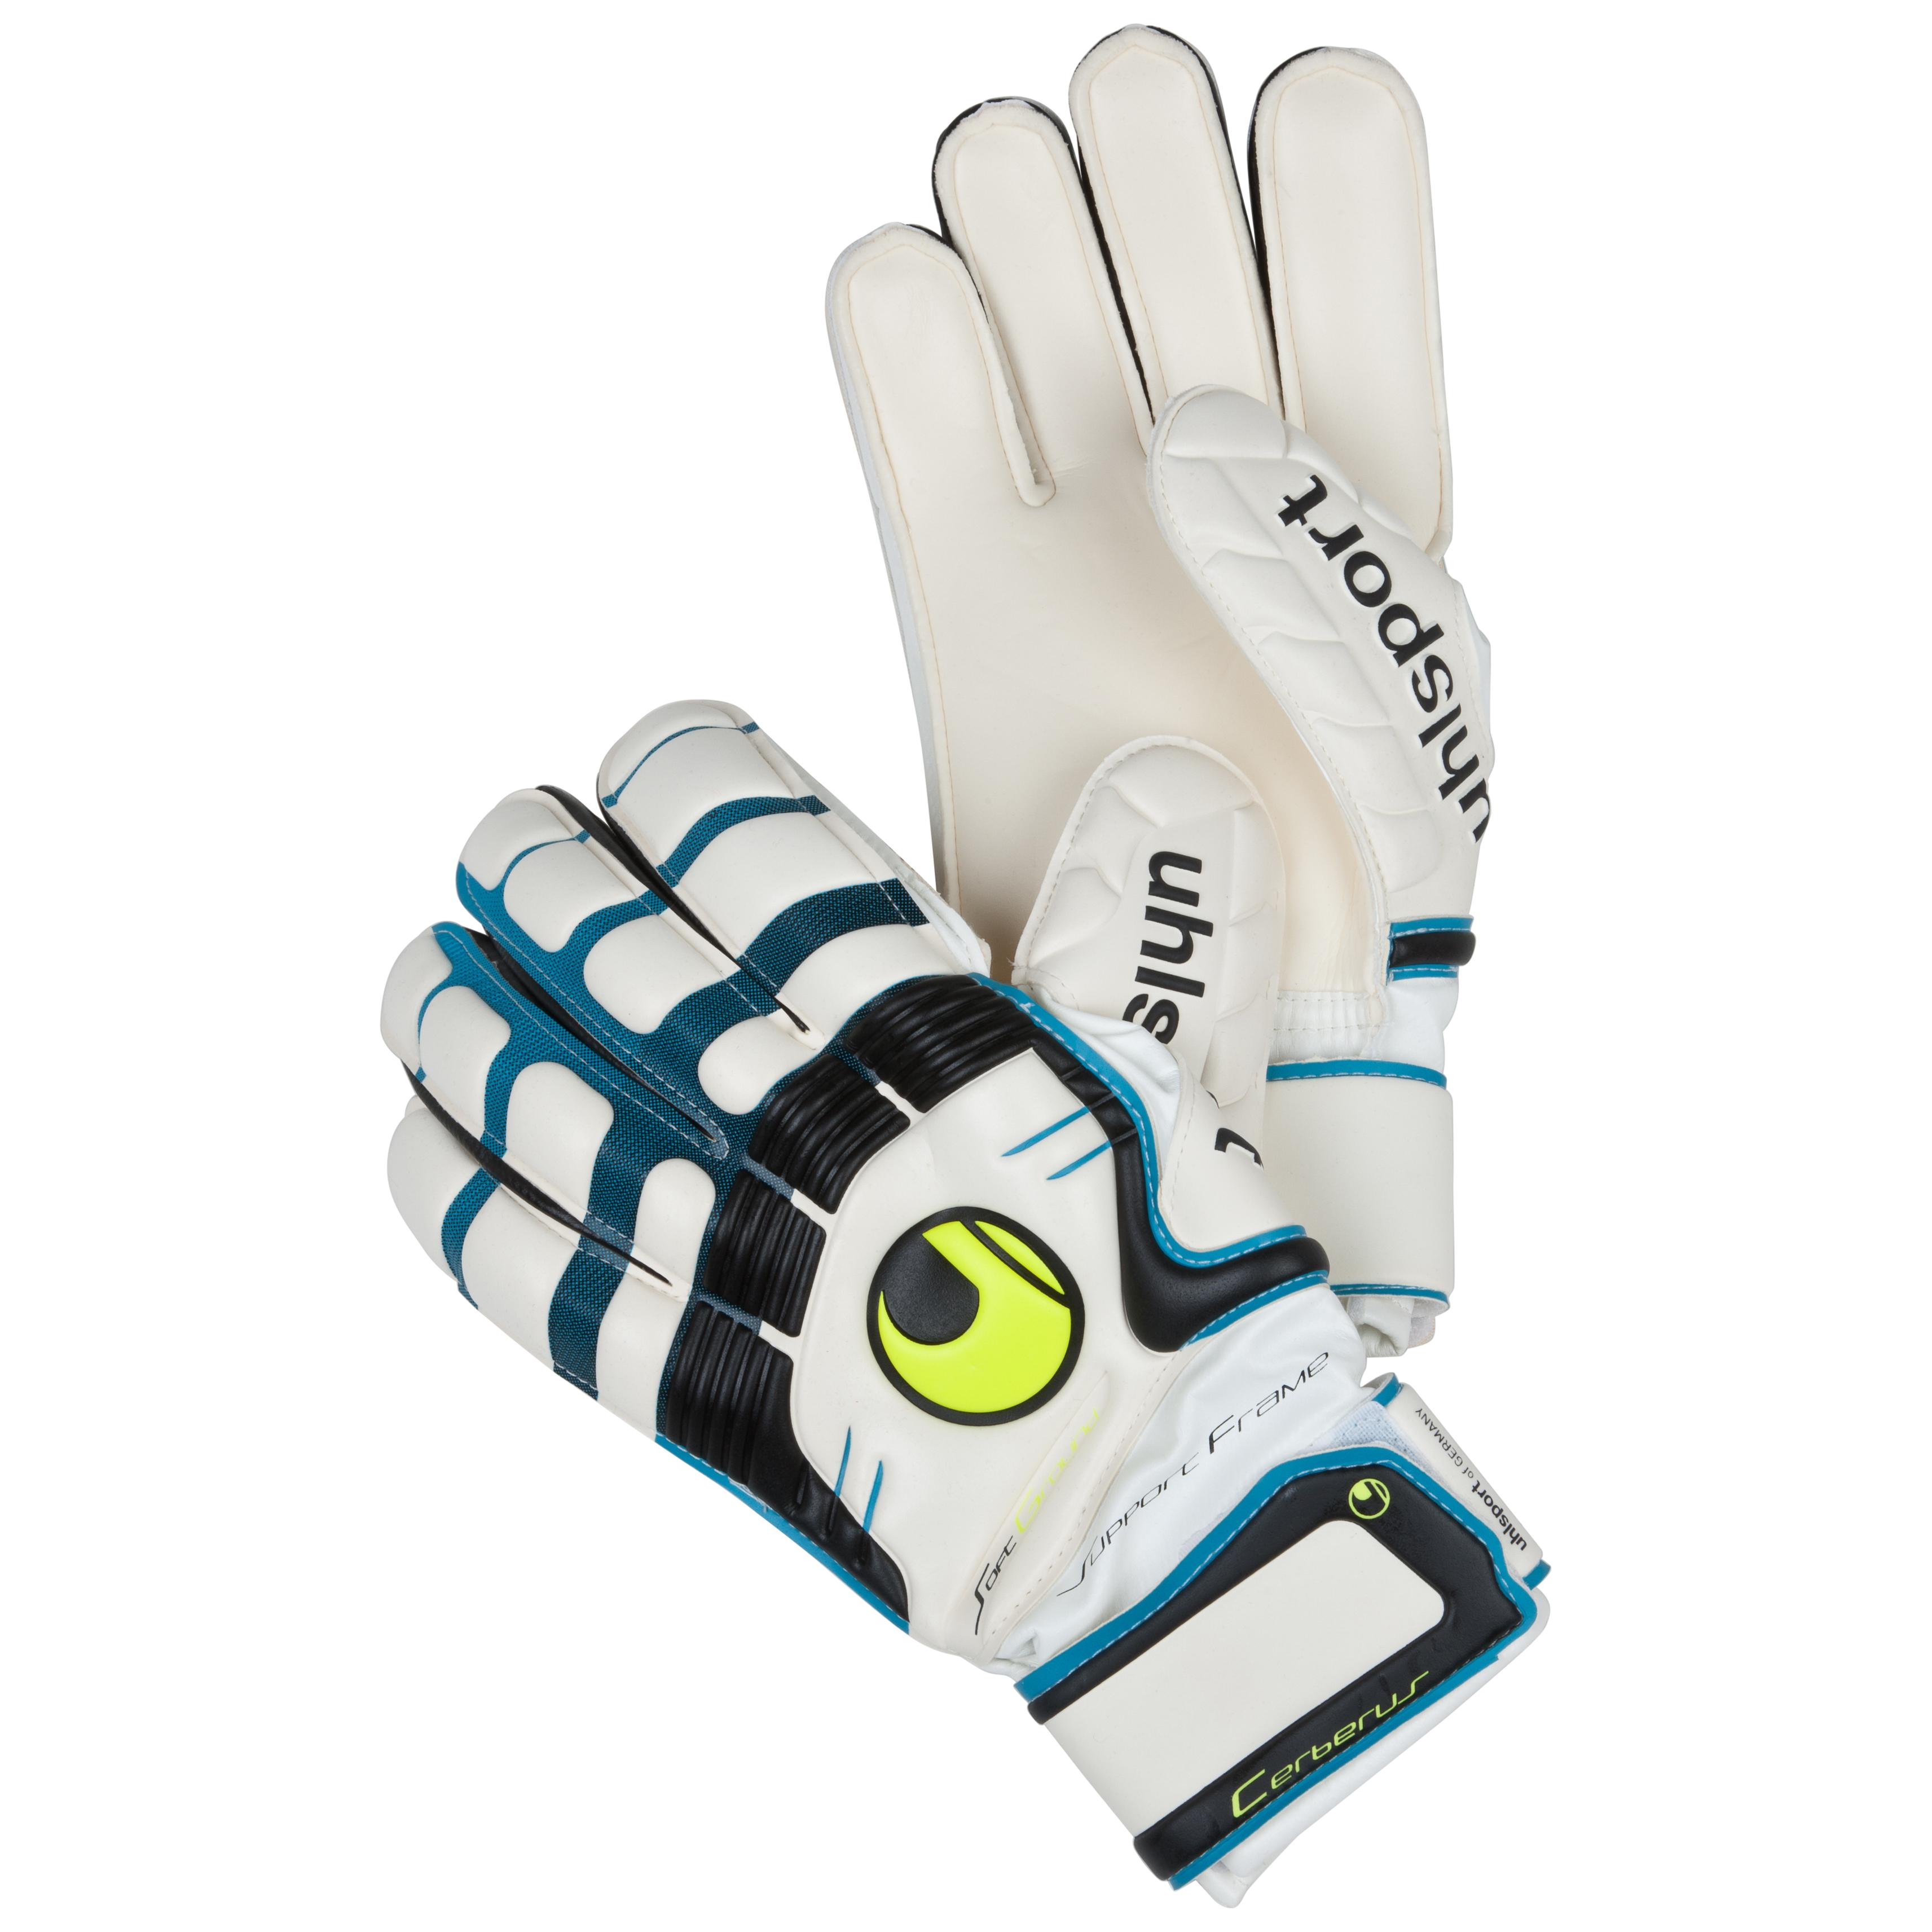 Uhlsport Cerberus Soft Supportframe Goalkeeper Gloves - White/Cyan/Black